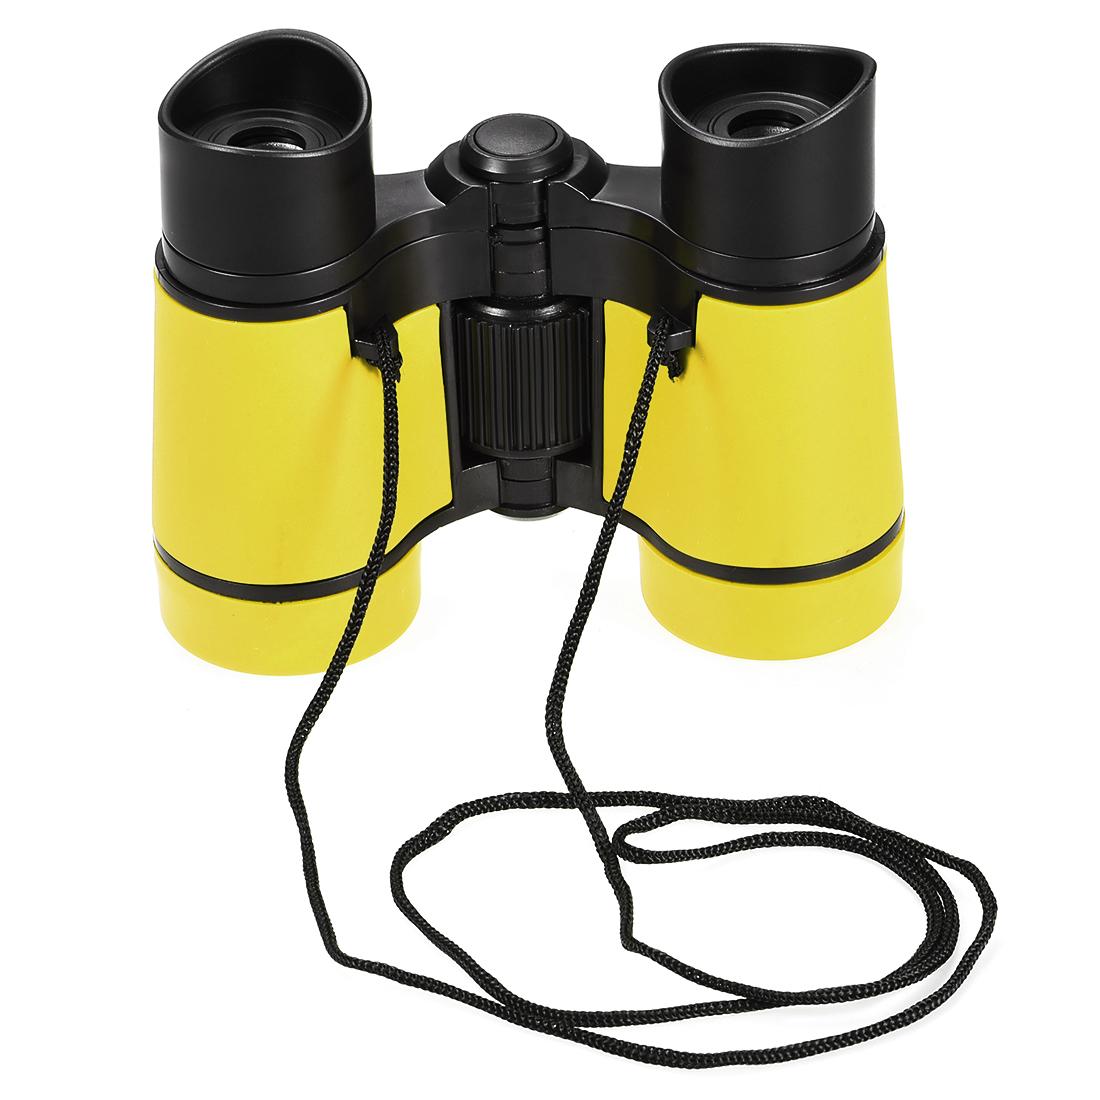 Toy Binoculars 4X30 Compact Foldable Binoculars Yellow with Neck Strap